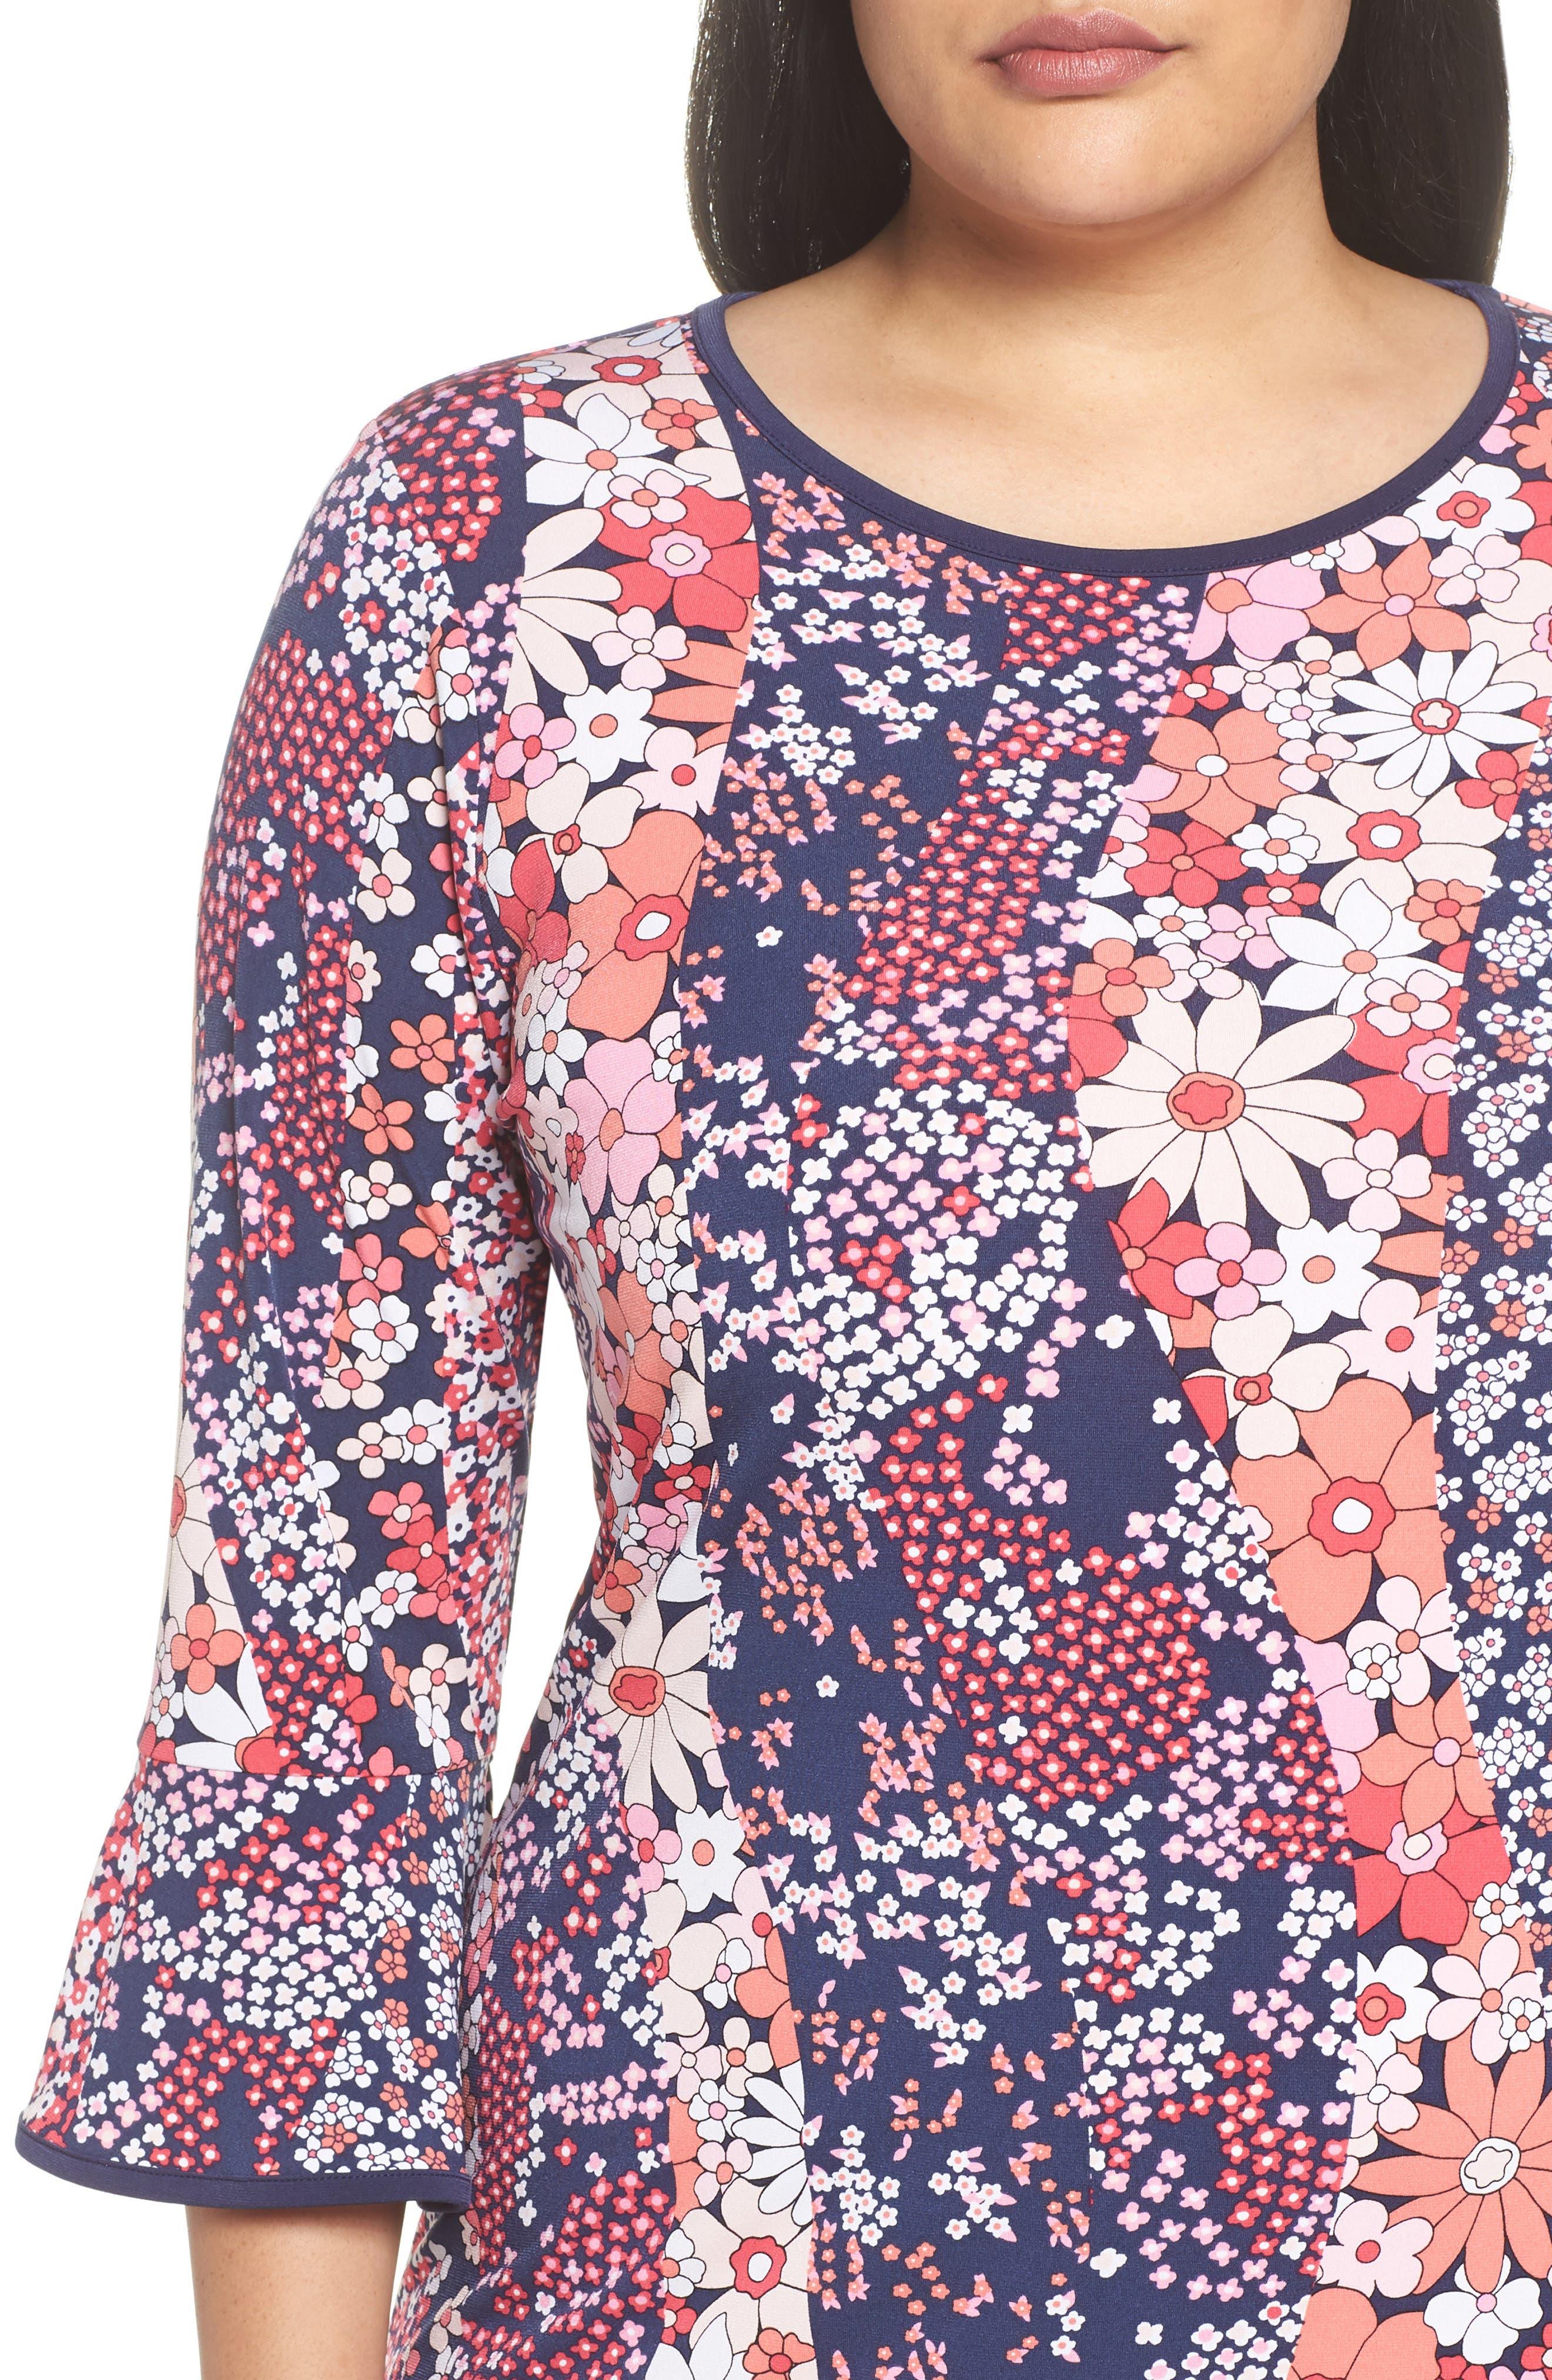 MICHAEL MICHAEL KORS,                             Patchwork Floral Bell Sleeve Shift Dress,                             Alternate thumbnail 4, color,                             679